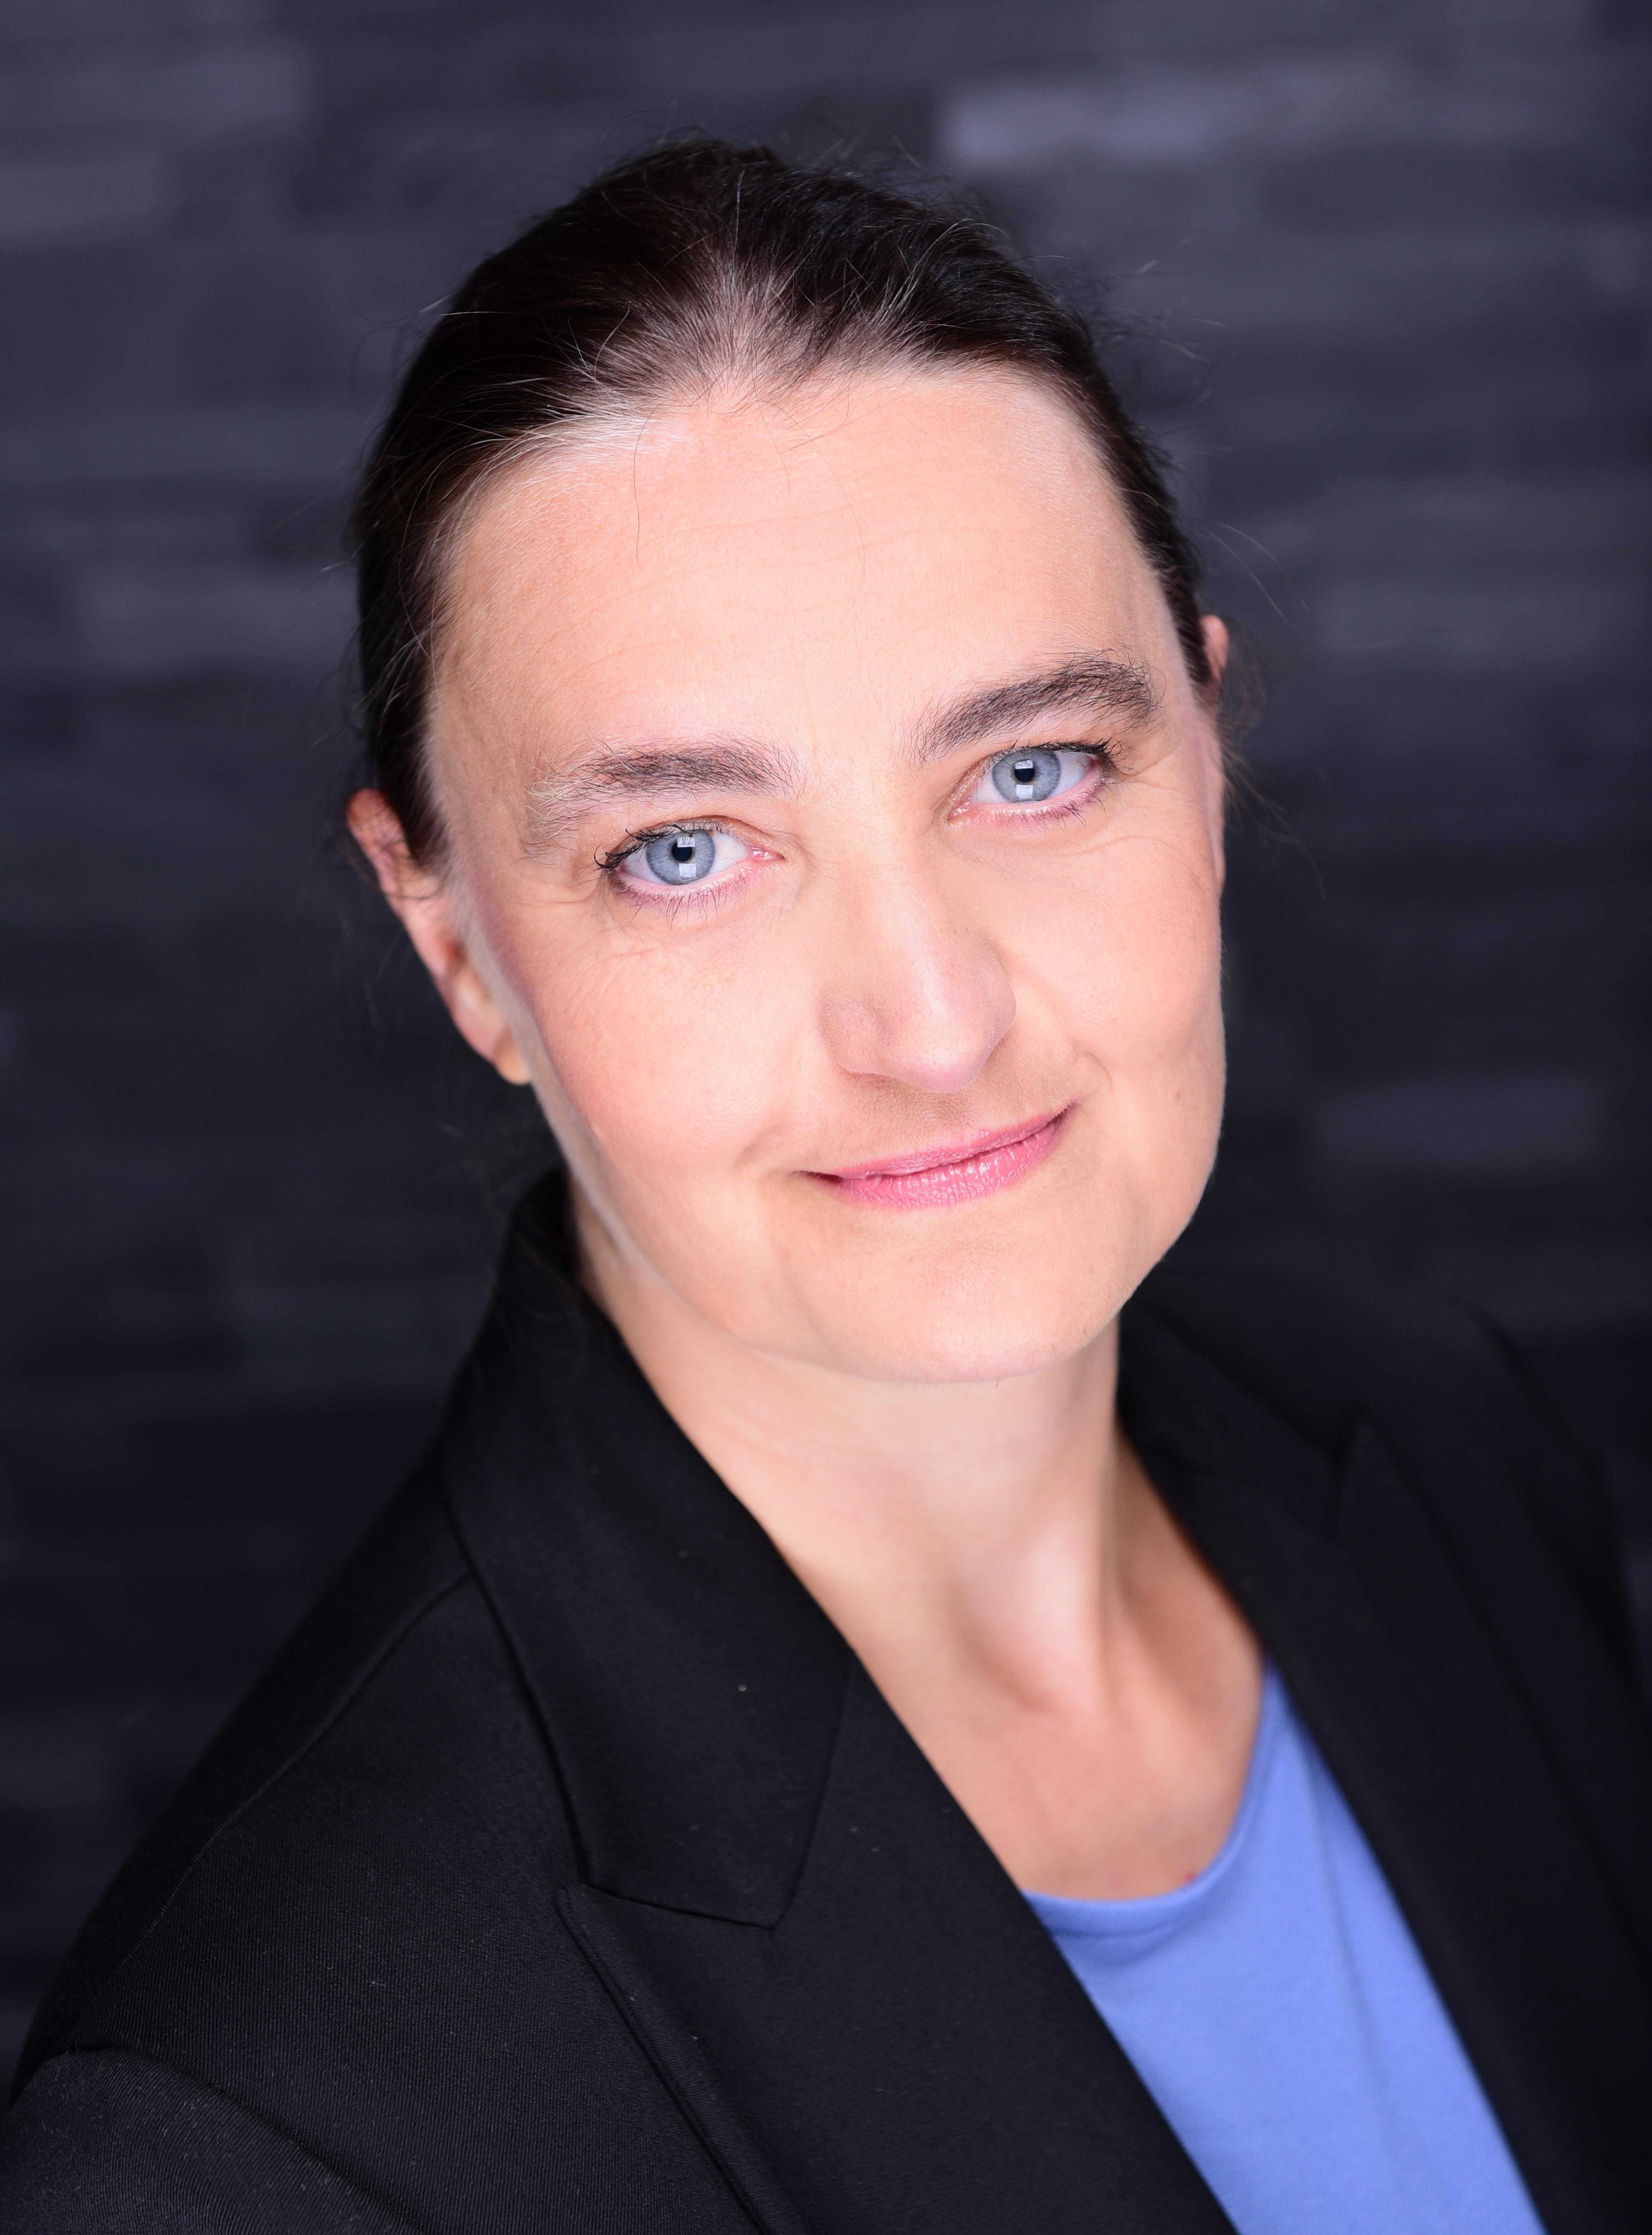 Dr. Ulrike Stohrer